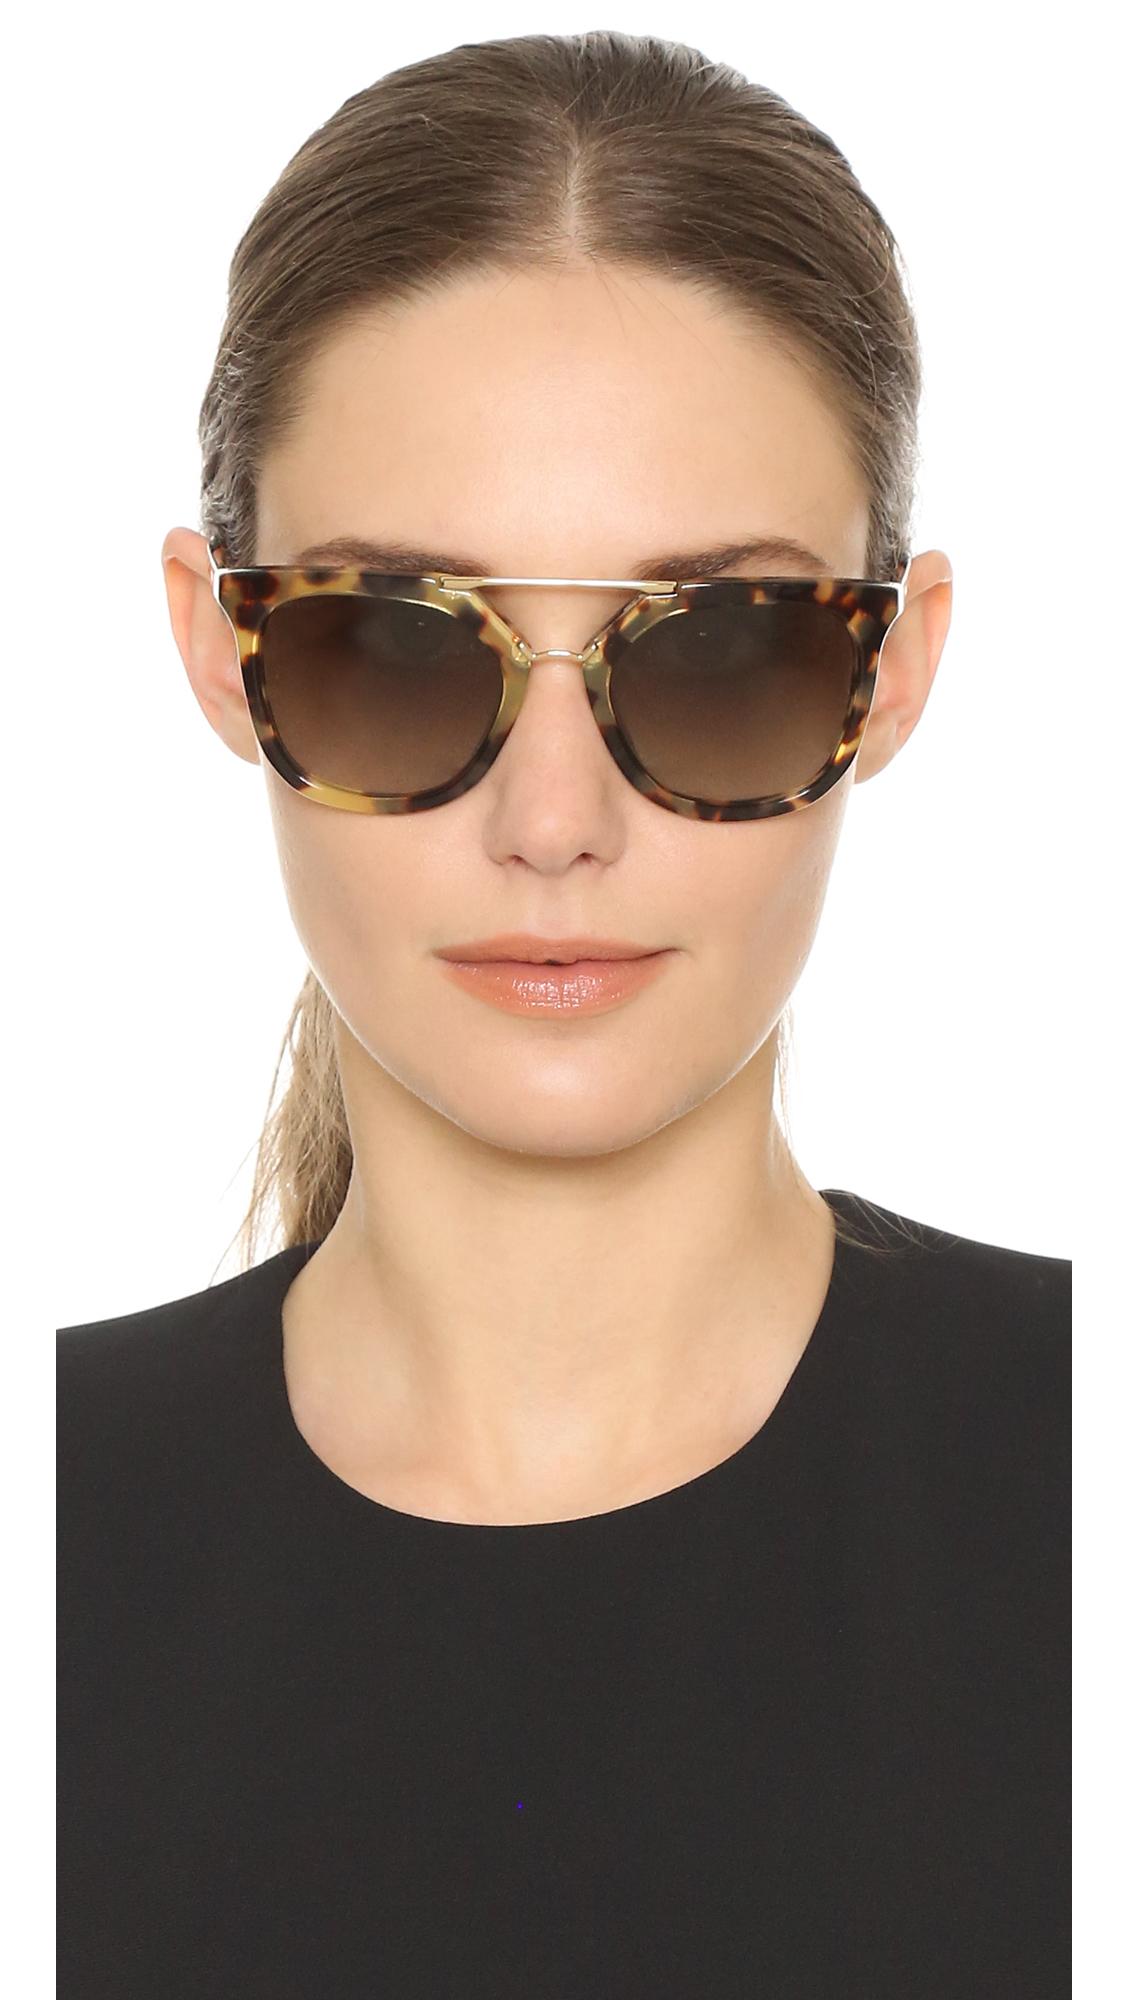 98644dffecc3 Prada Thick Frame Aviator Sunglasses in Green - Lyst